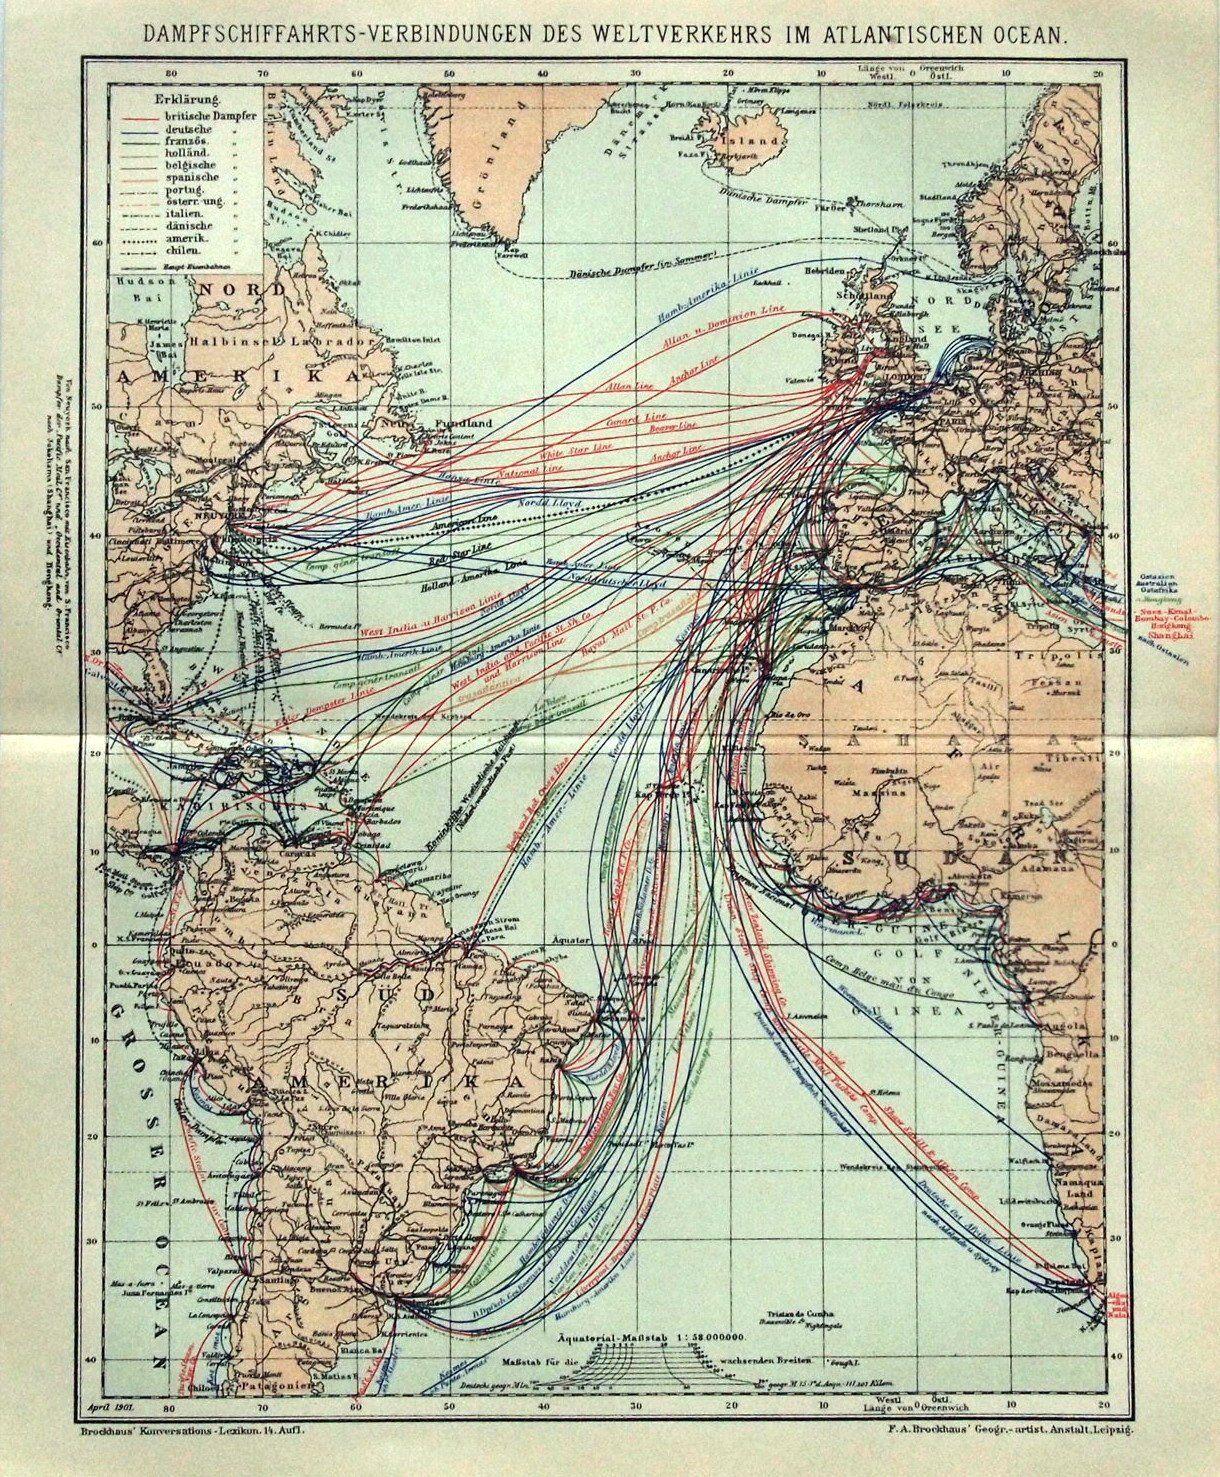 Un Mapa Aleman De 1895 Con Las Rutas Maritimas De Barcos A Vapor